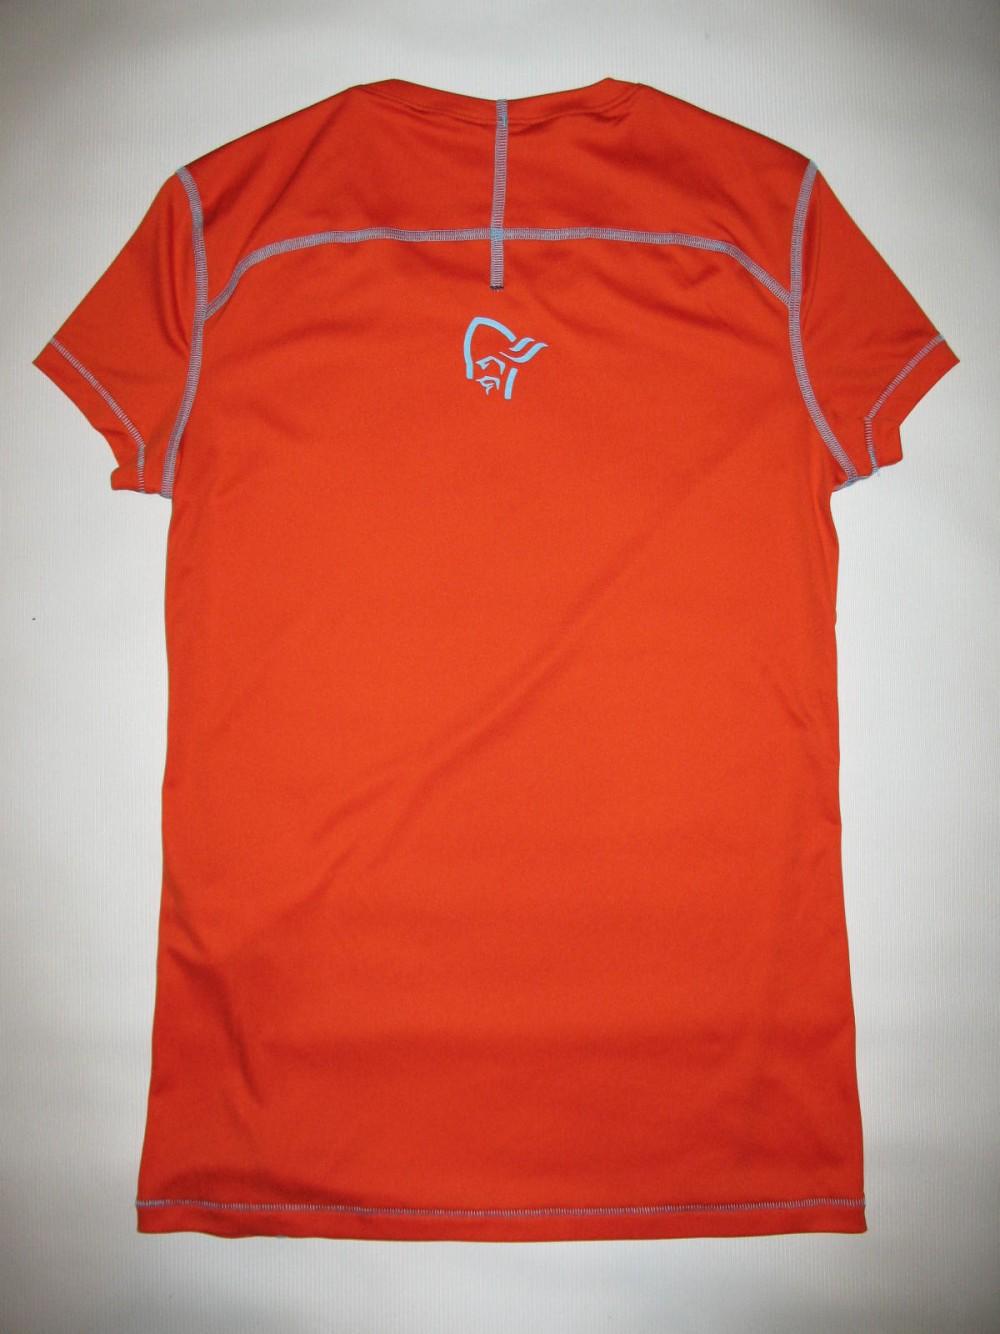 Футболка NORRONA 29 tech t-shirt lady (размер S) - 2